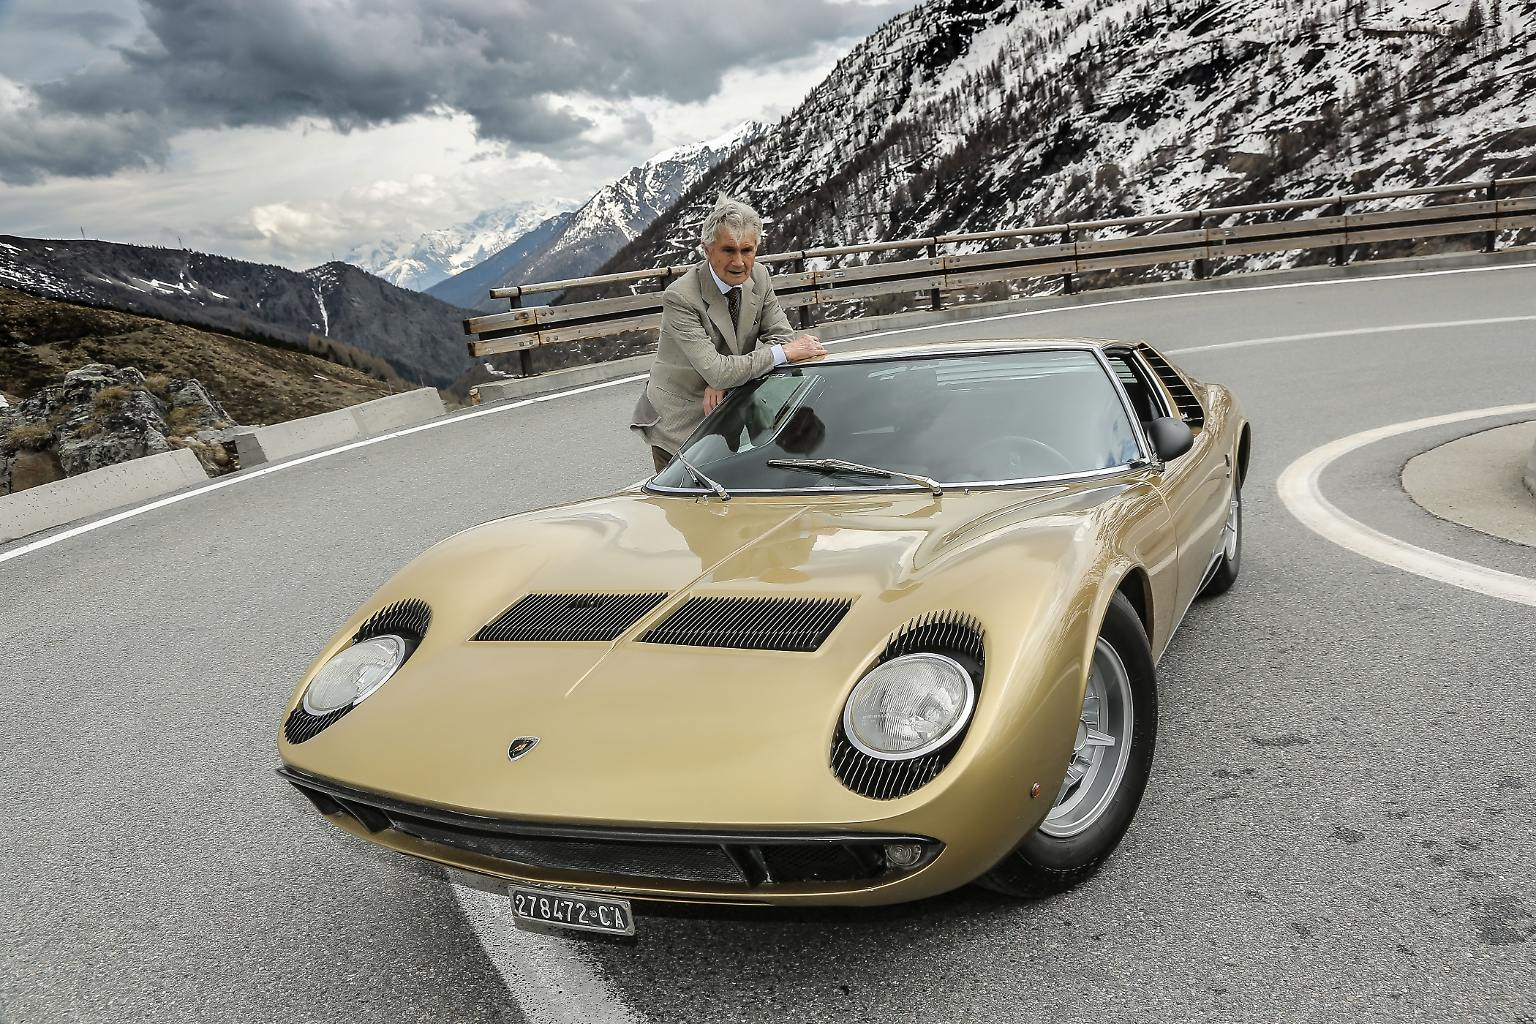 01_Lamborghini_Miura_Designer_Marcello_Gandini.jpg